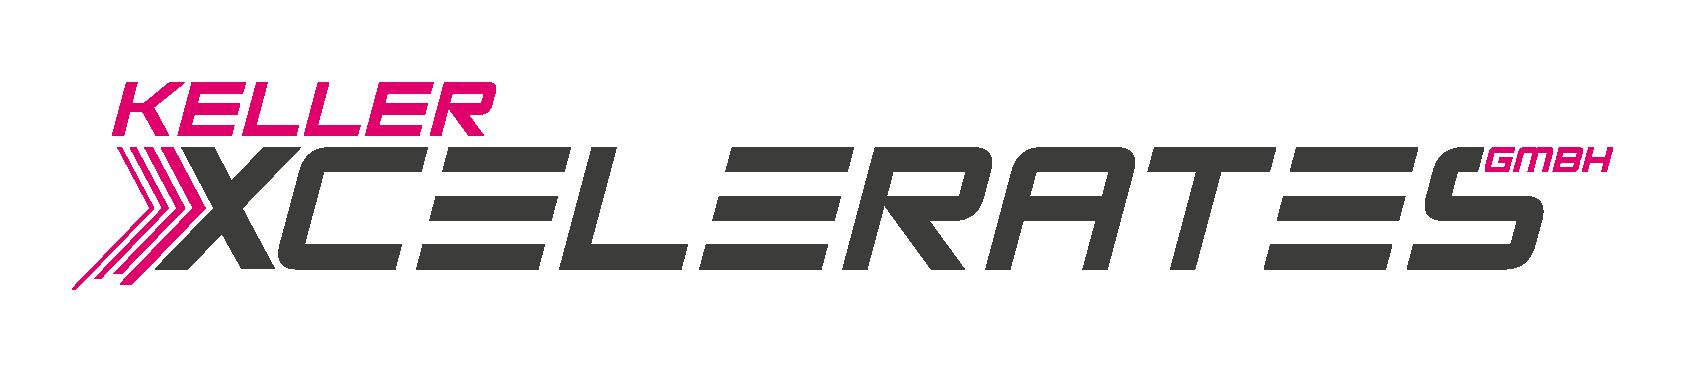 KELLER_20-06_Logo_xcelerate_WEB